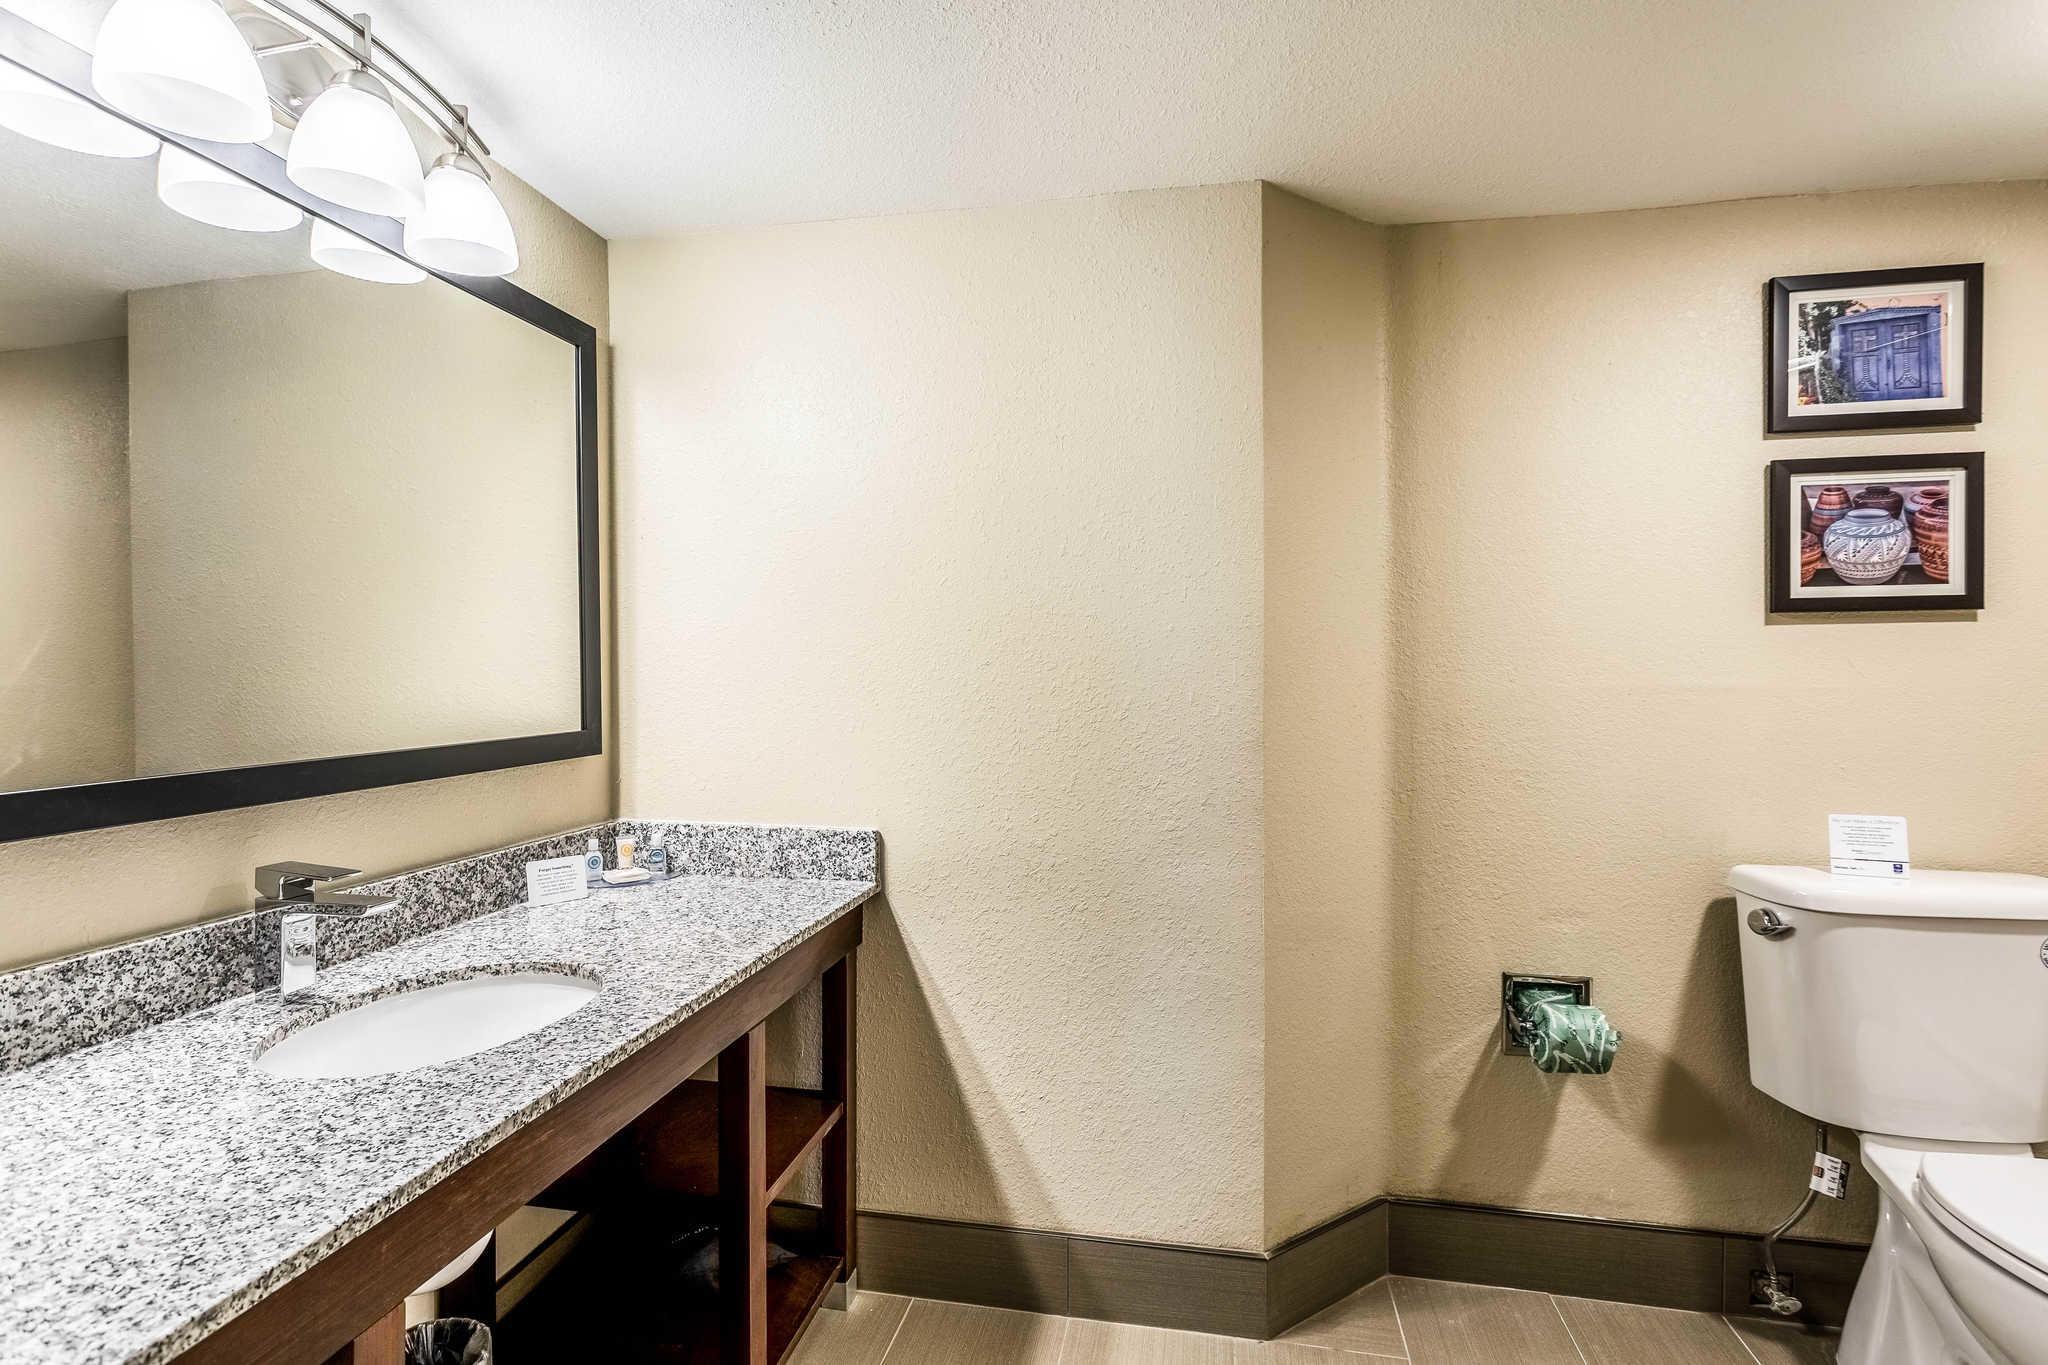 Comfort Inn & Suites Albuquerque Downtown image 21